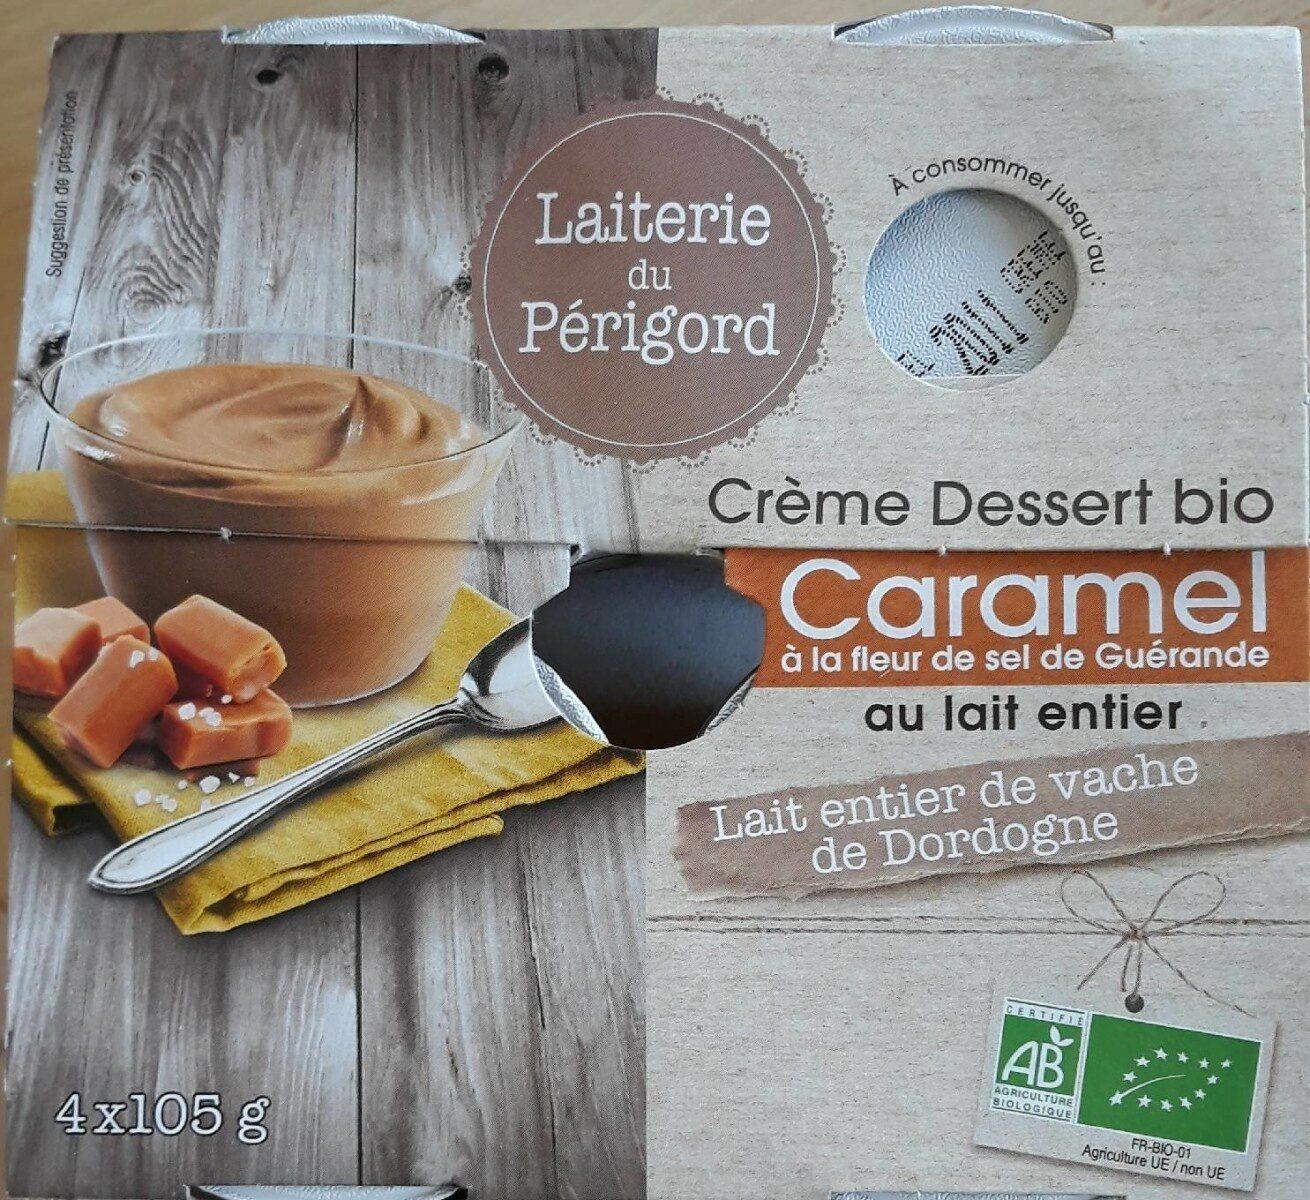 Crême Dessert bio au Caramel à la fleur de sel - Produit - fr